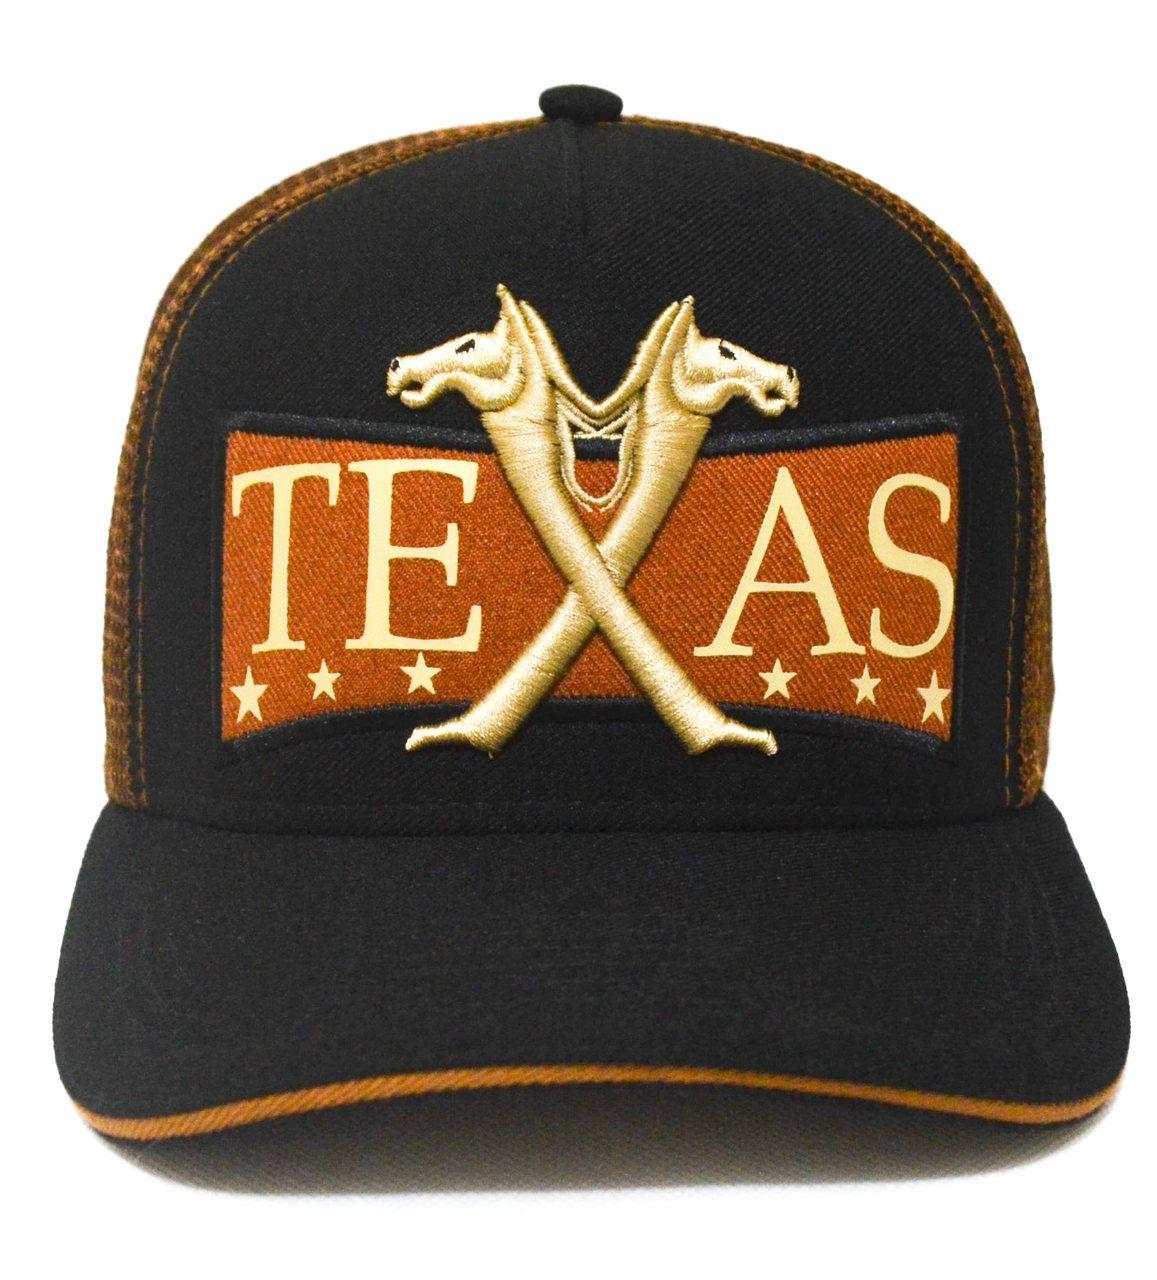 77f274a87da52 Boné Country Texas Aba Curva Preto e Dourado Queimado Feminino Masculino